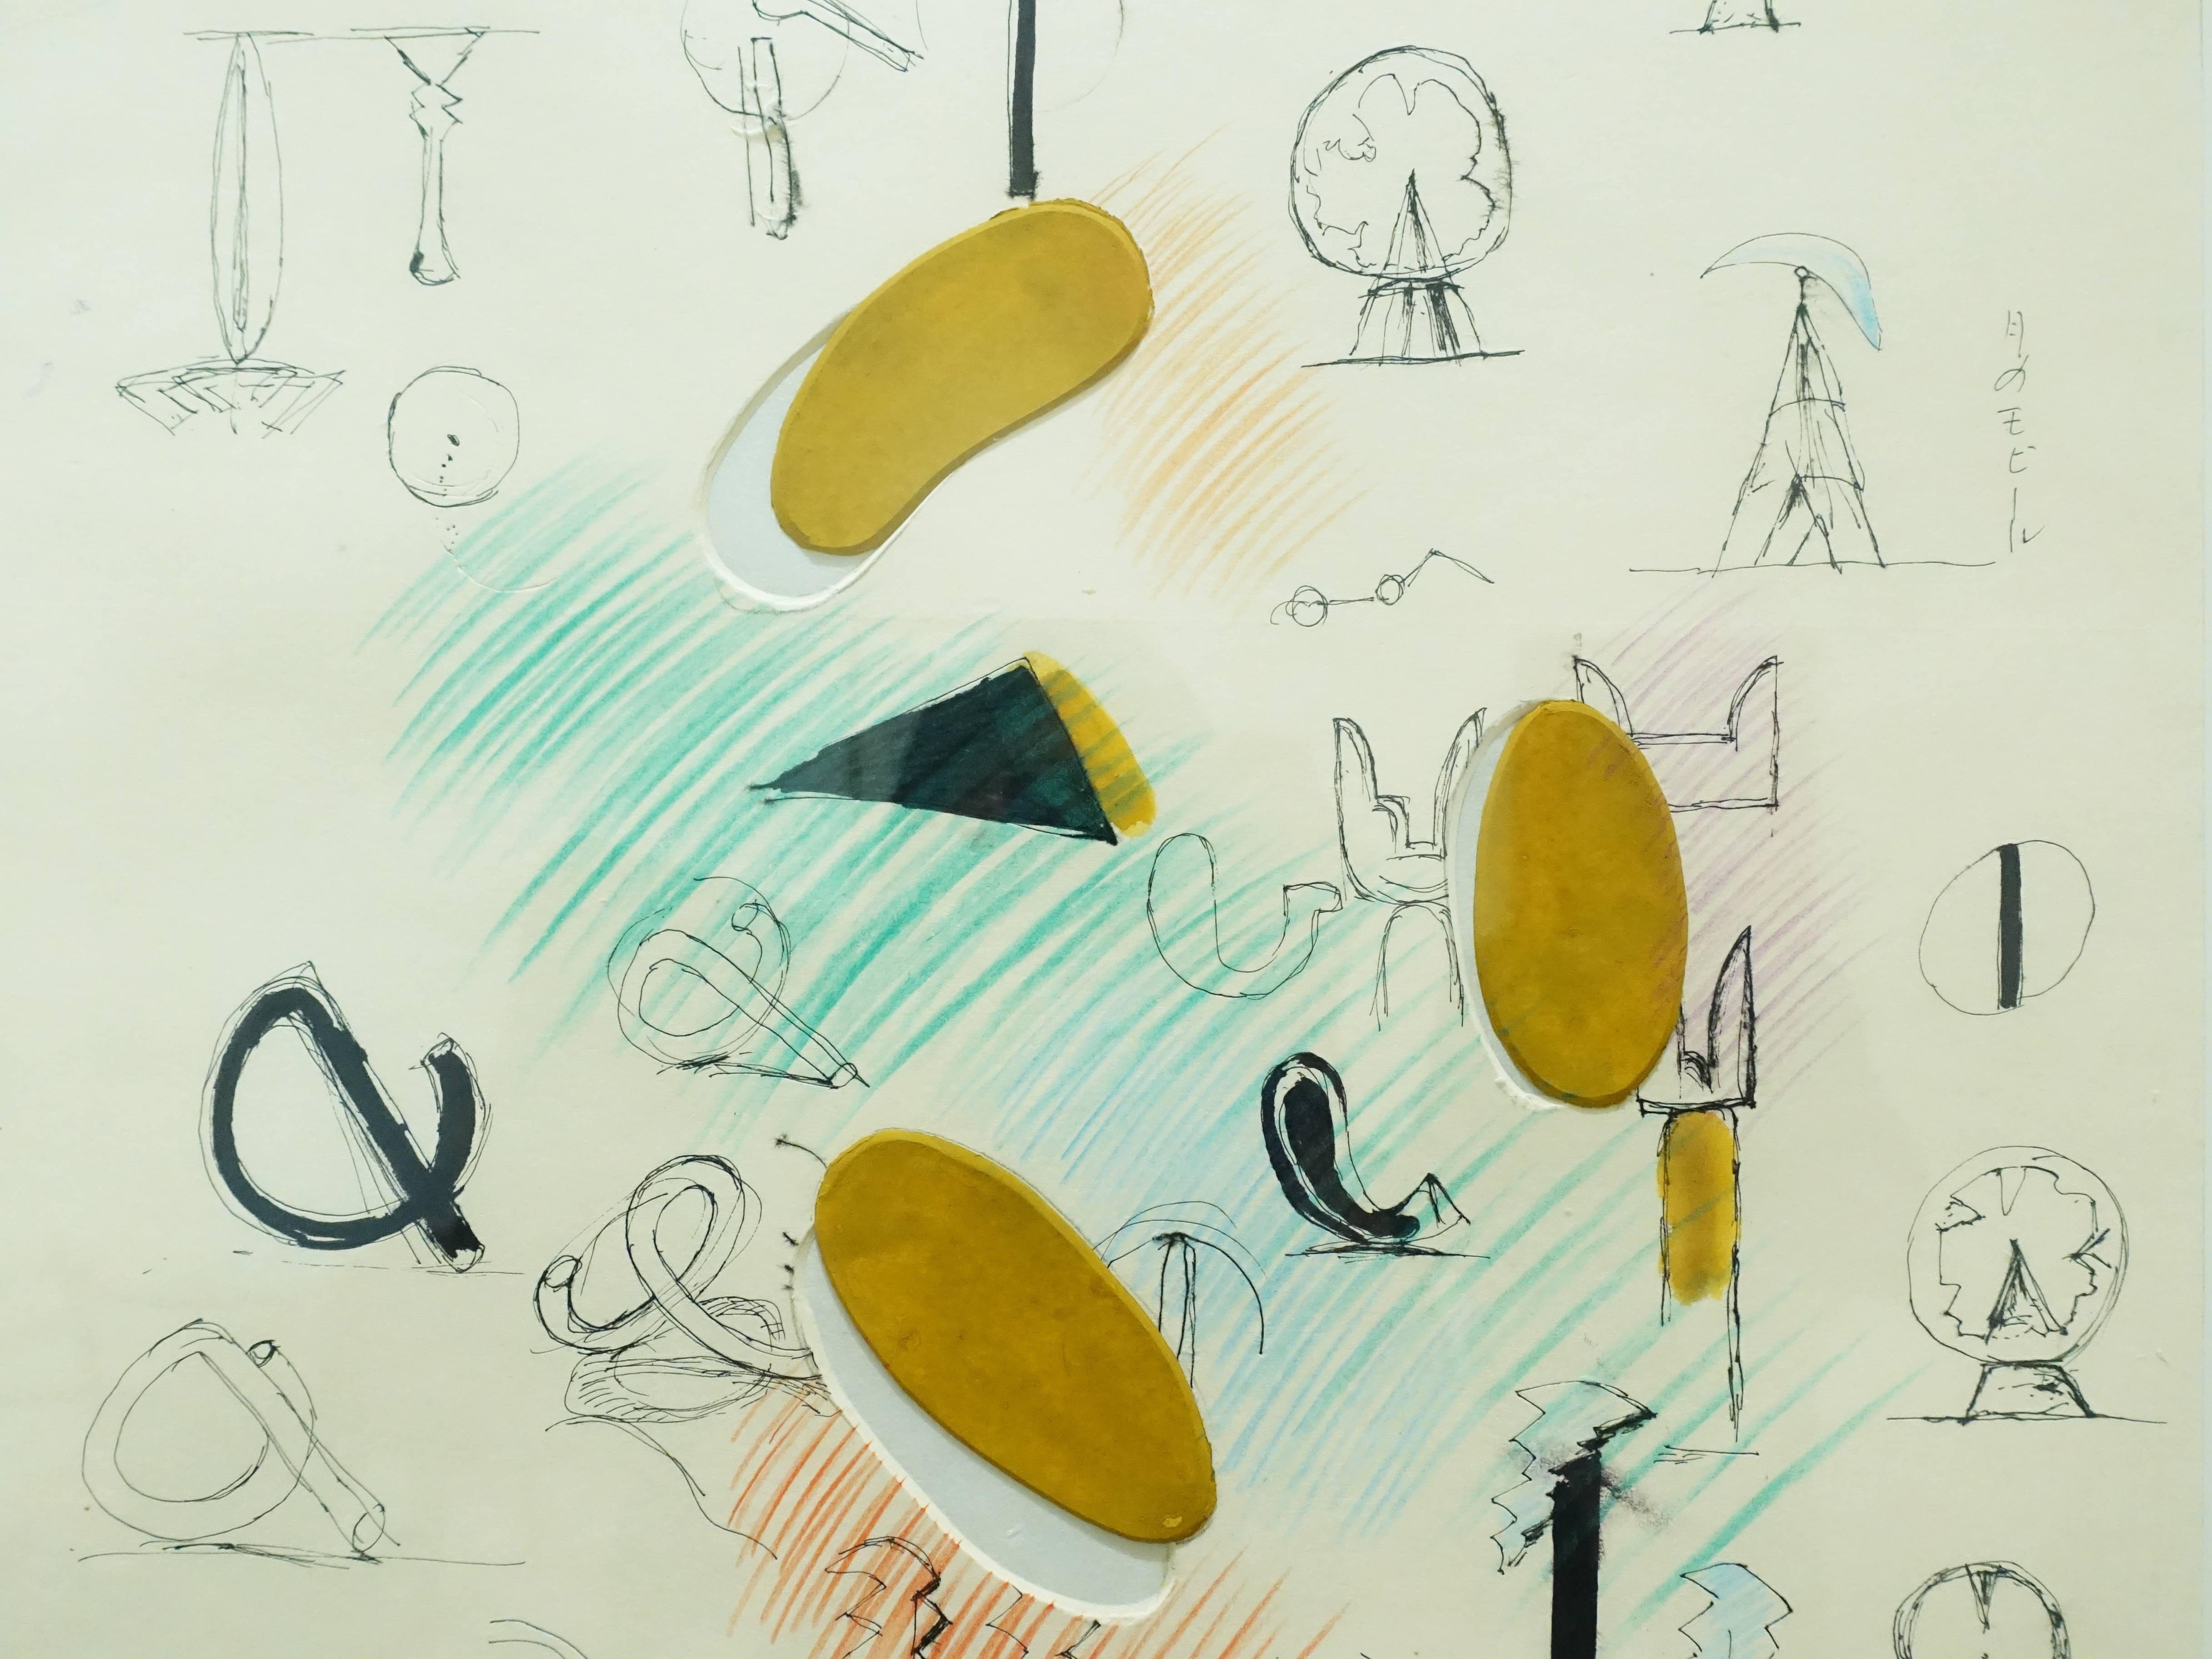 関根伸夫,《Three locations》細節,54 x 42 cm,Mixed media、paper,1999。